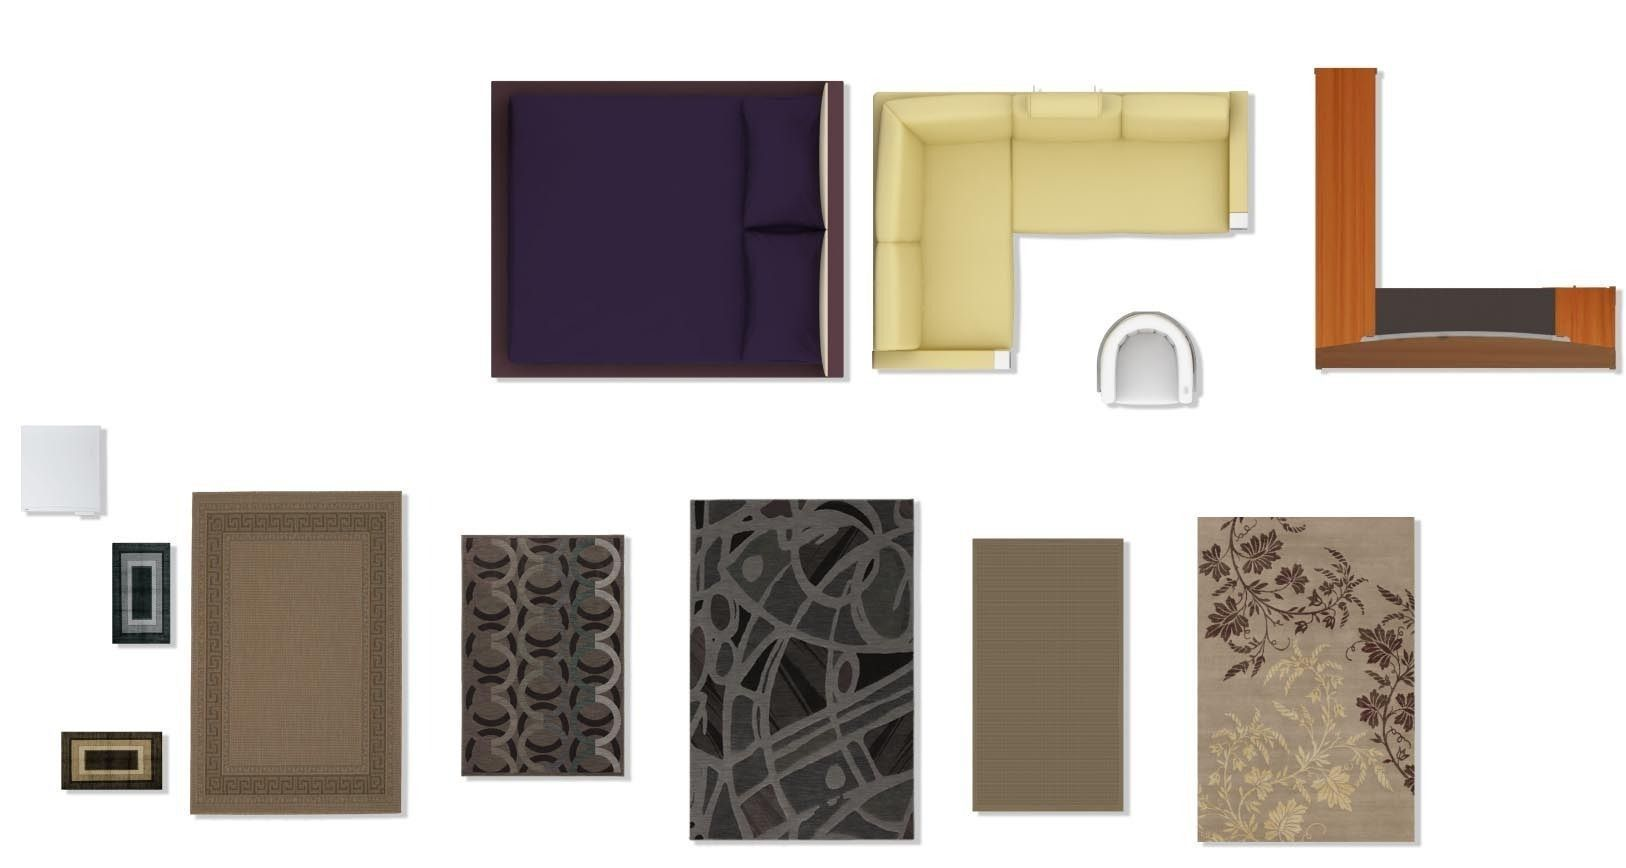 Psd 2d floorplan furniture 3d model 2d furniture and for 3d wardrobe planner